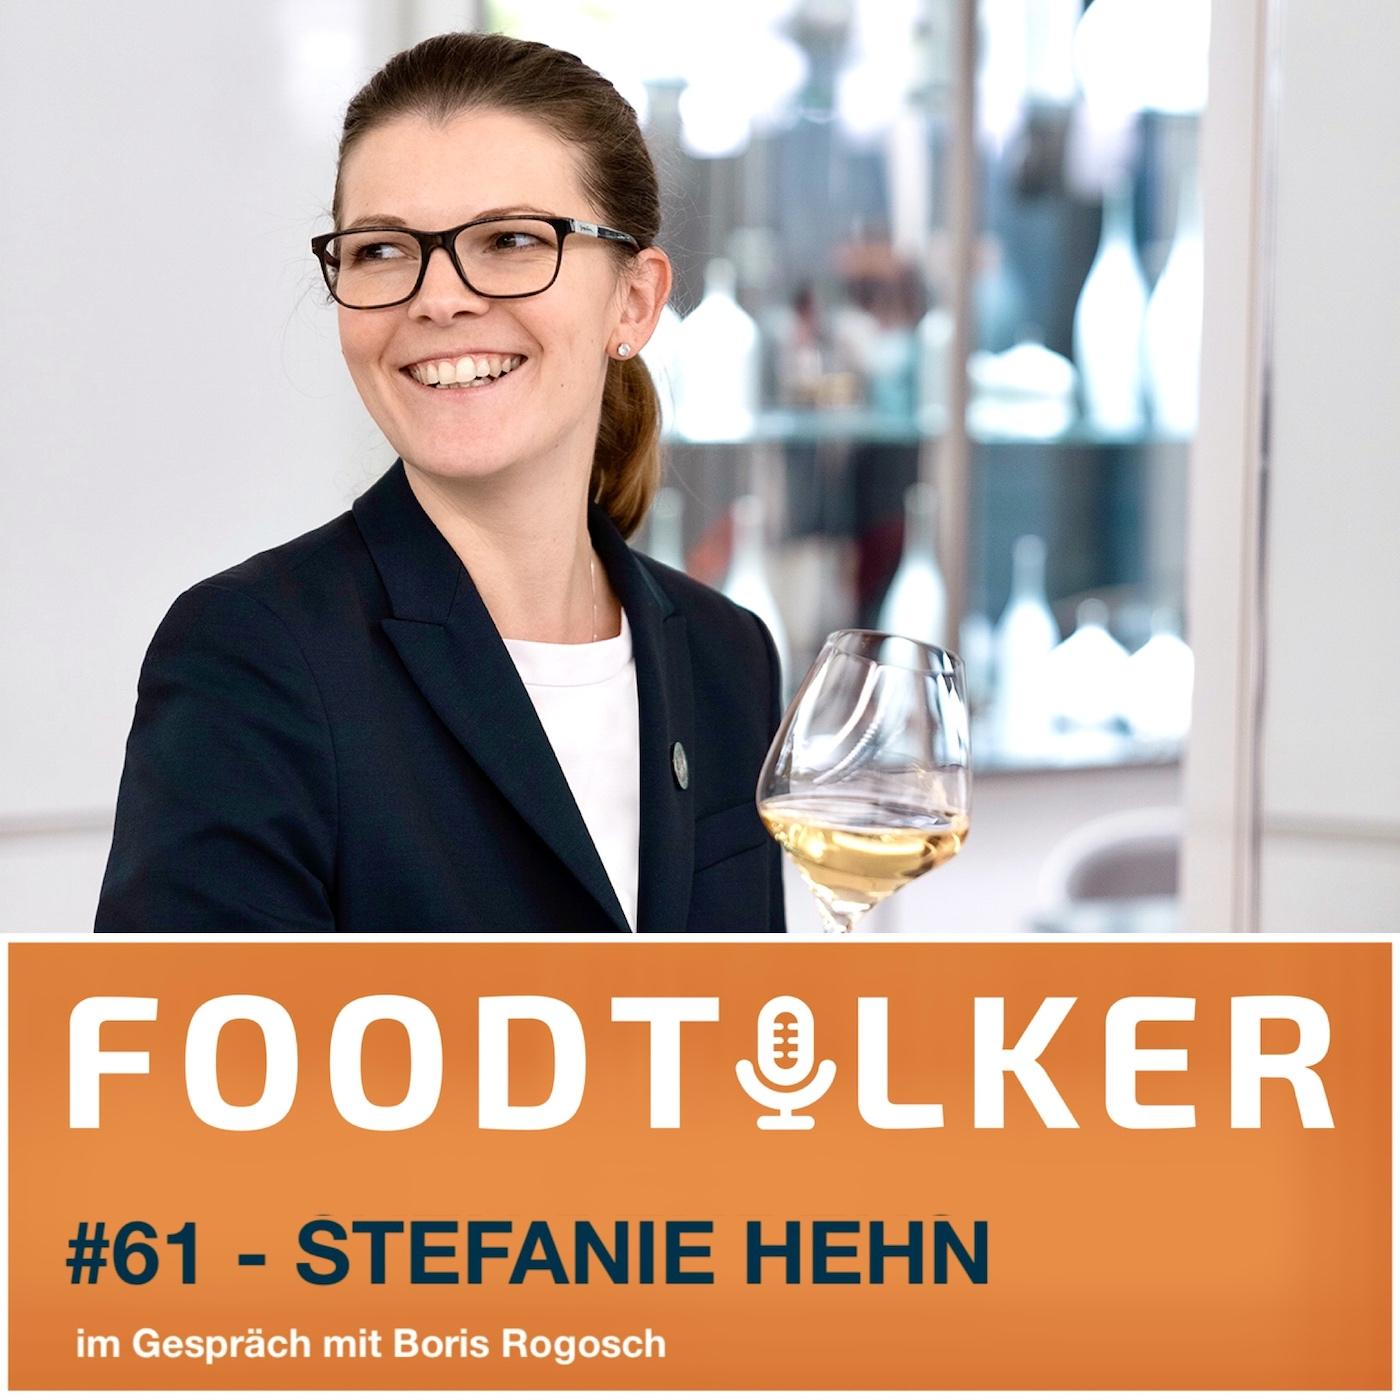 Stefanie Hehn - Chef Sommelière - The Fontenay